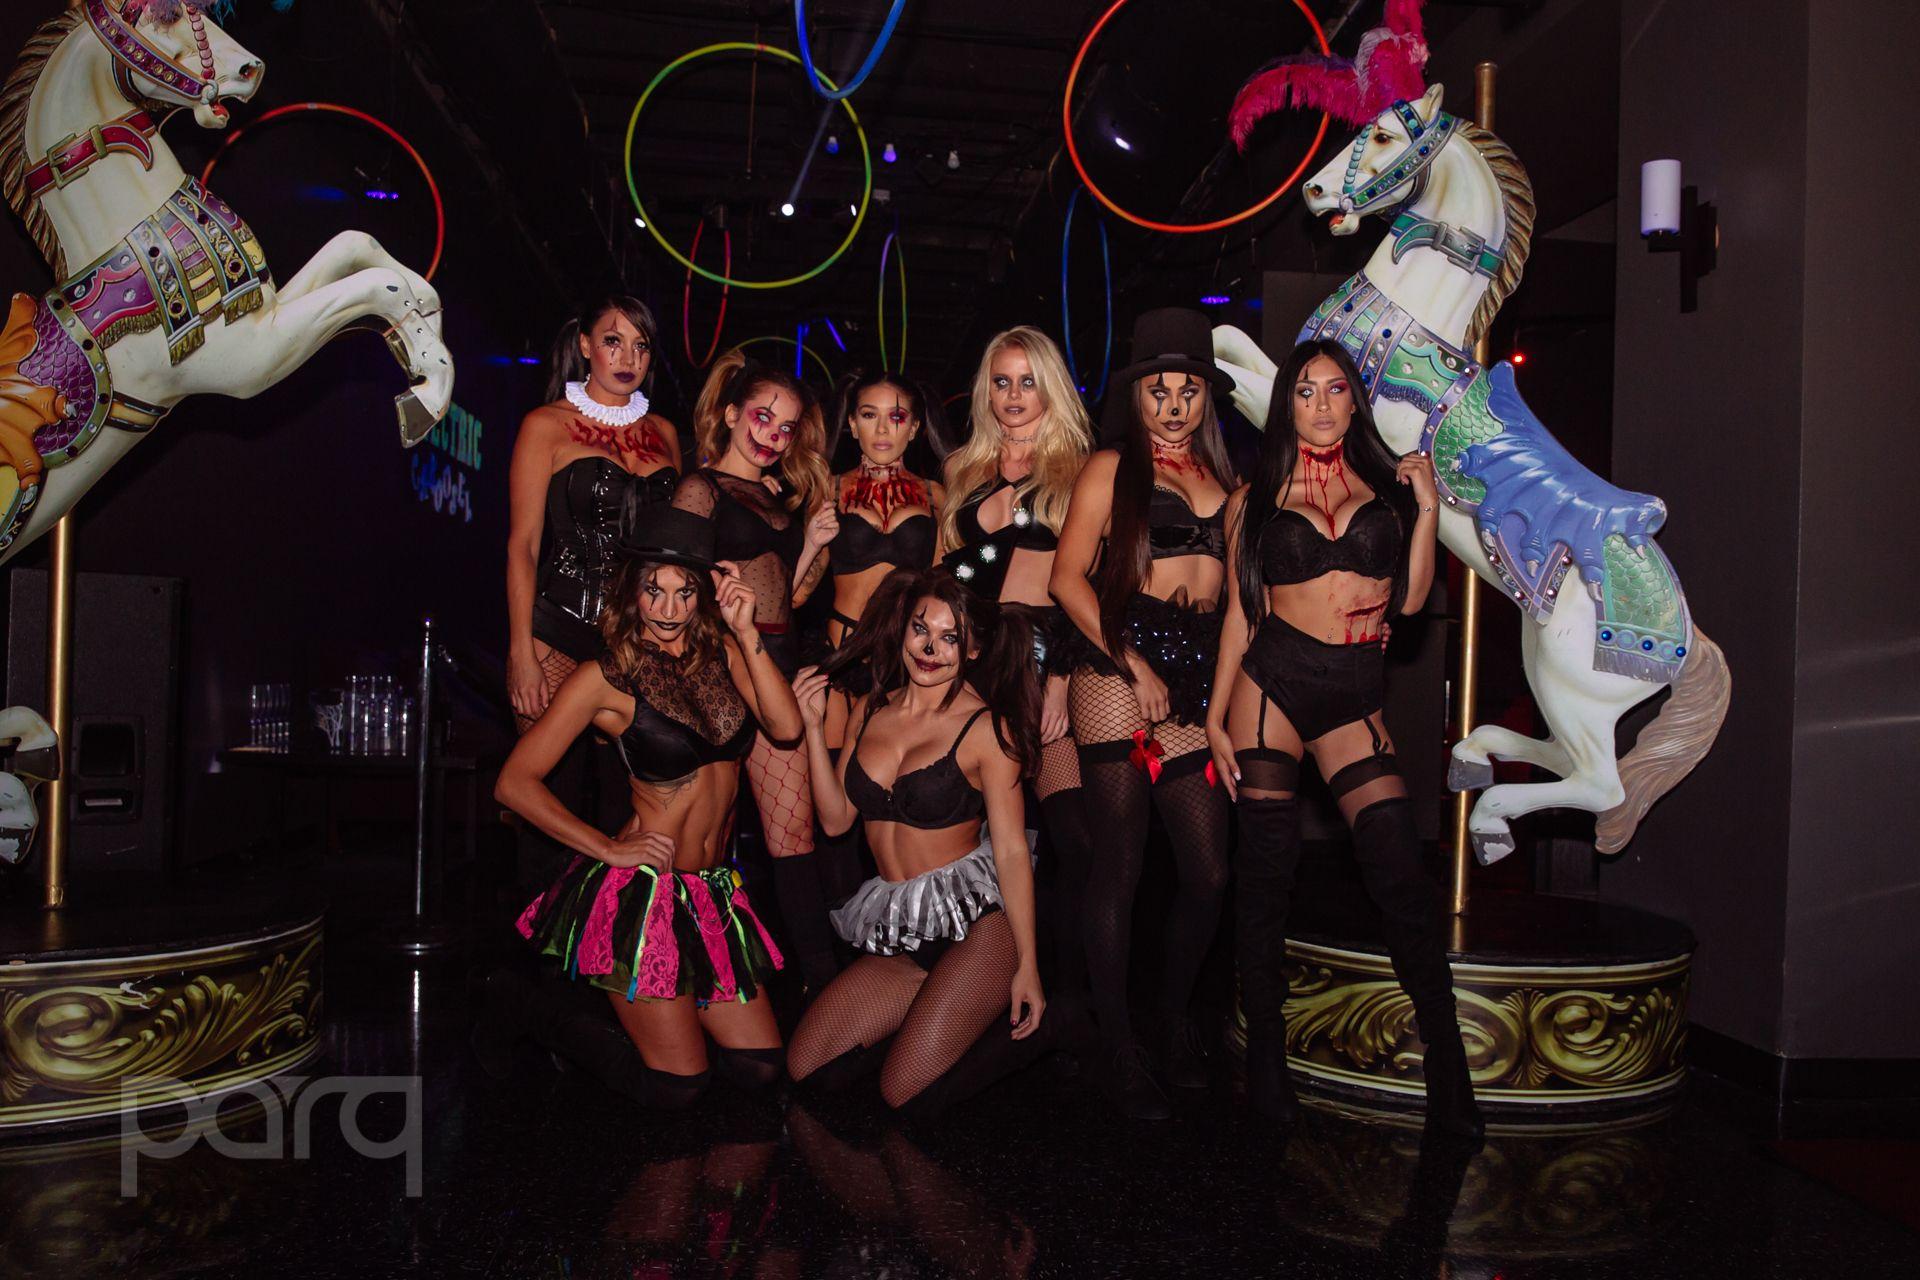 10.28.17 Parq - Haunted Circus-5.jpg